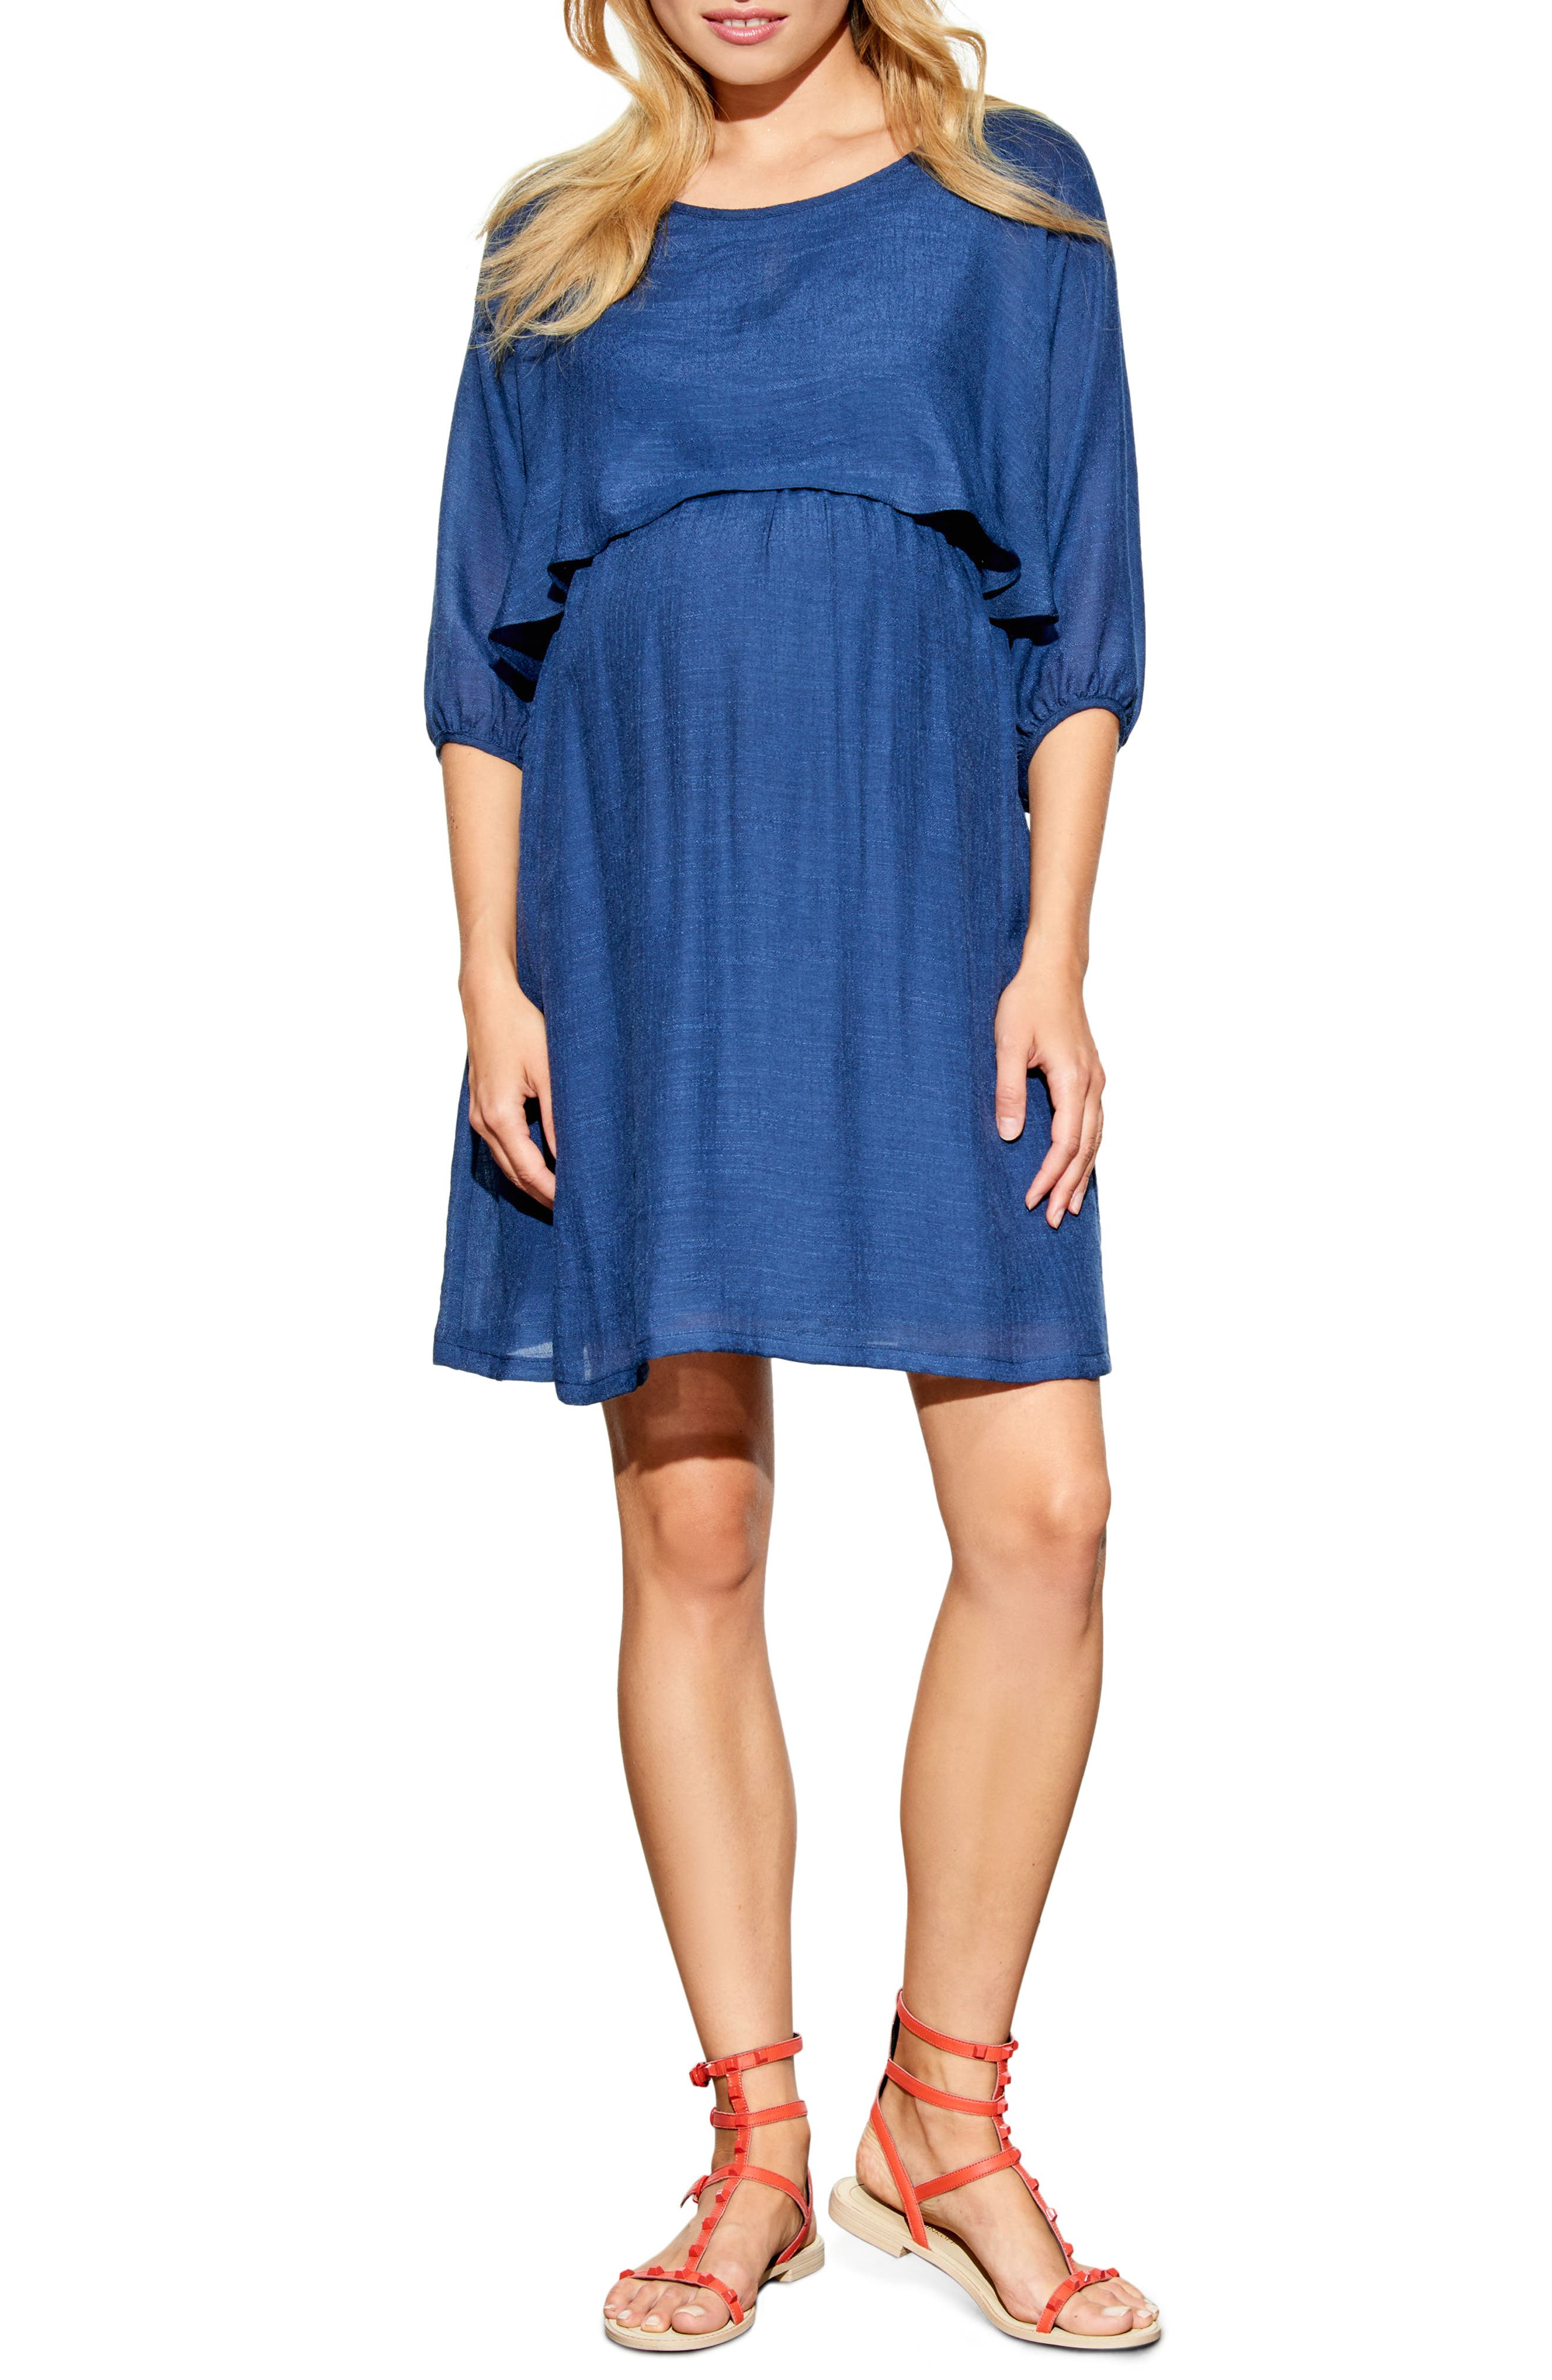 Ruffle Overlay Maternity/Nursing Dress,                         Main,                         color, Navy